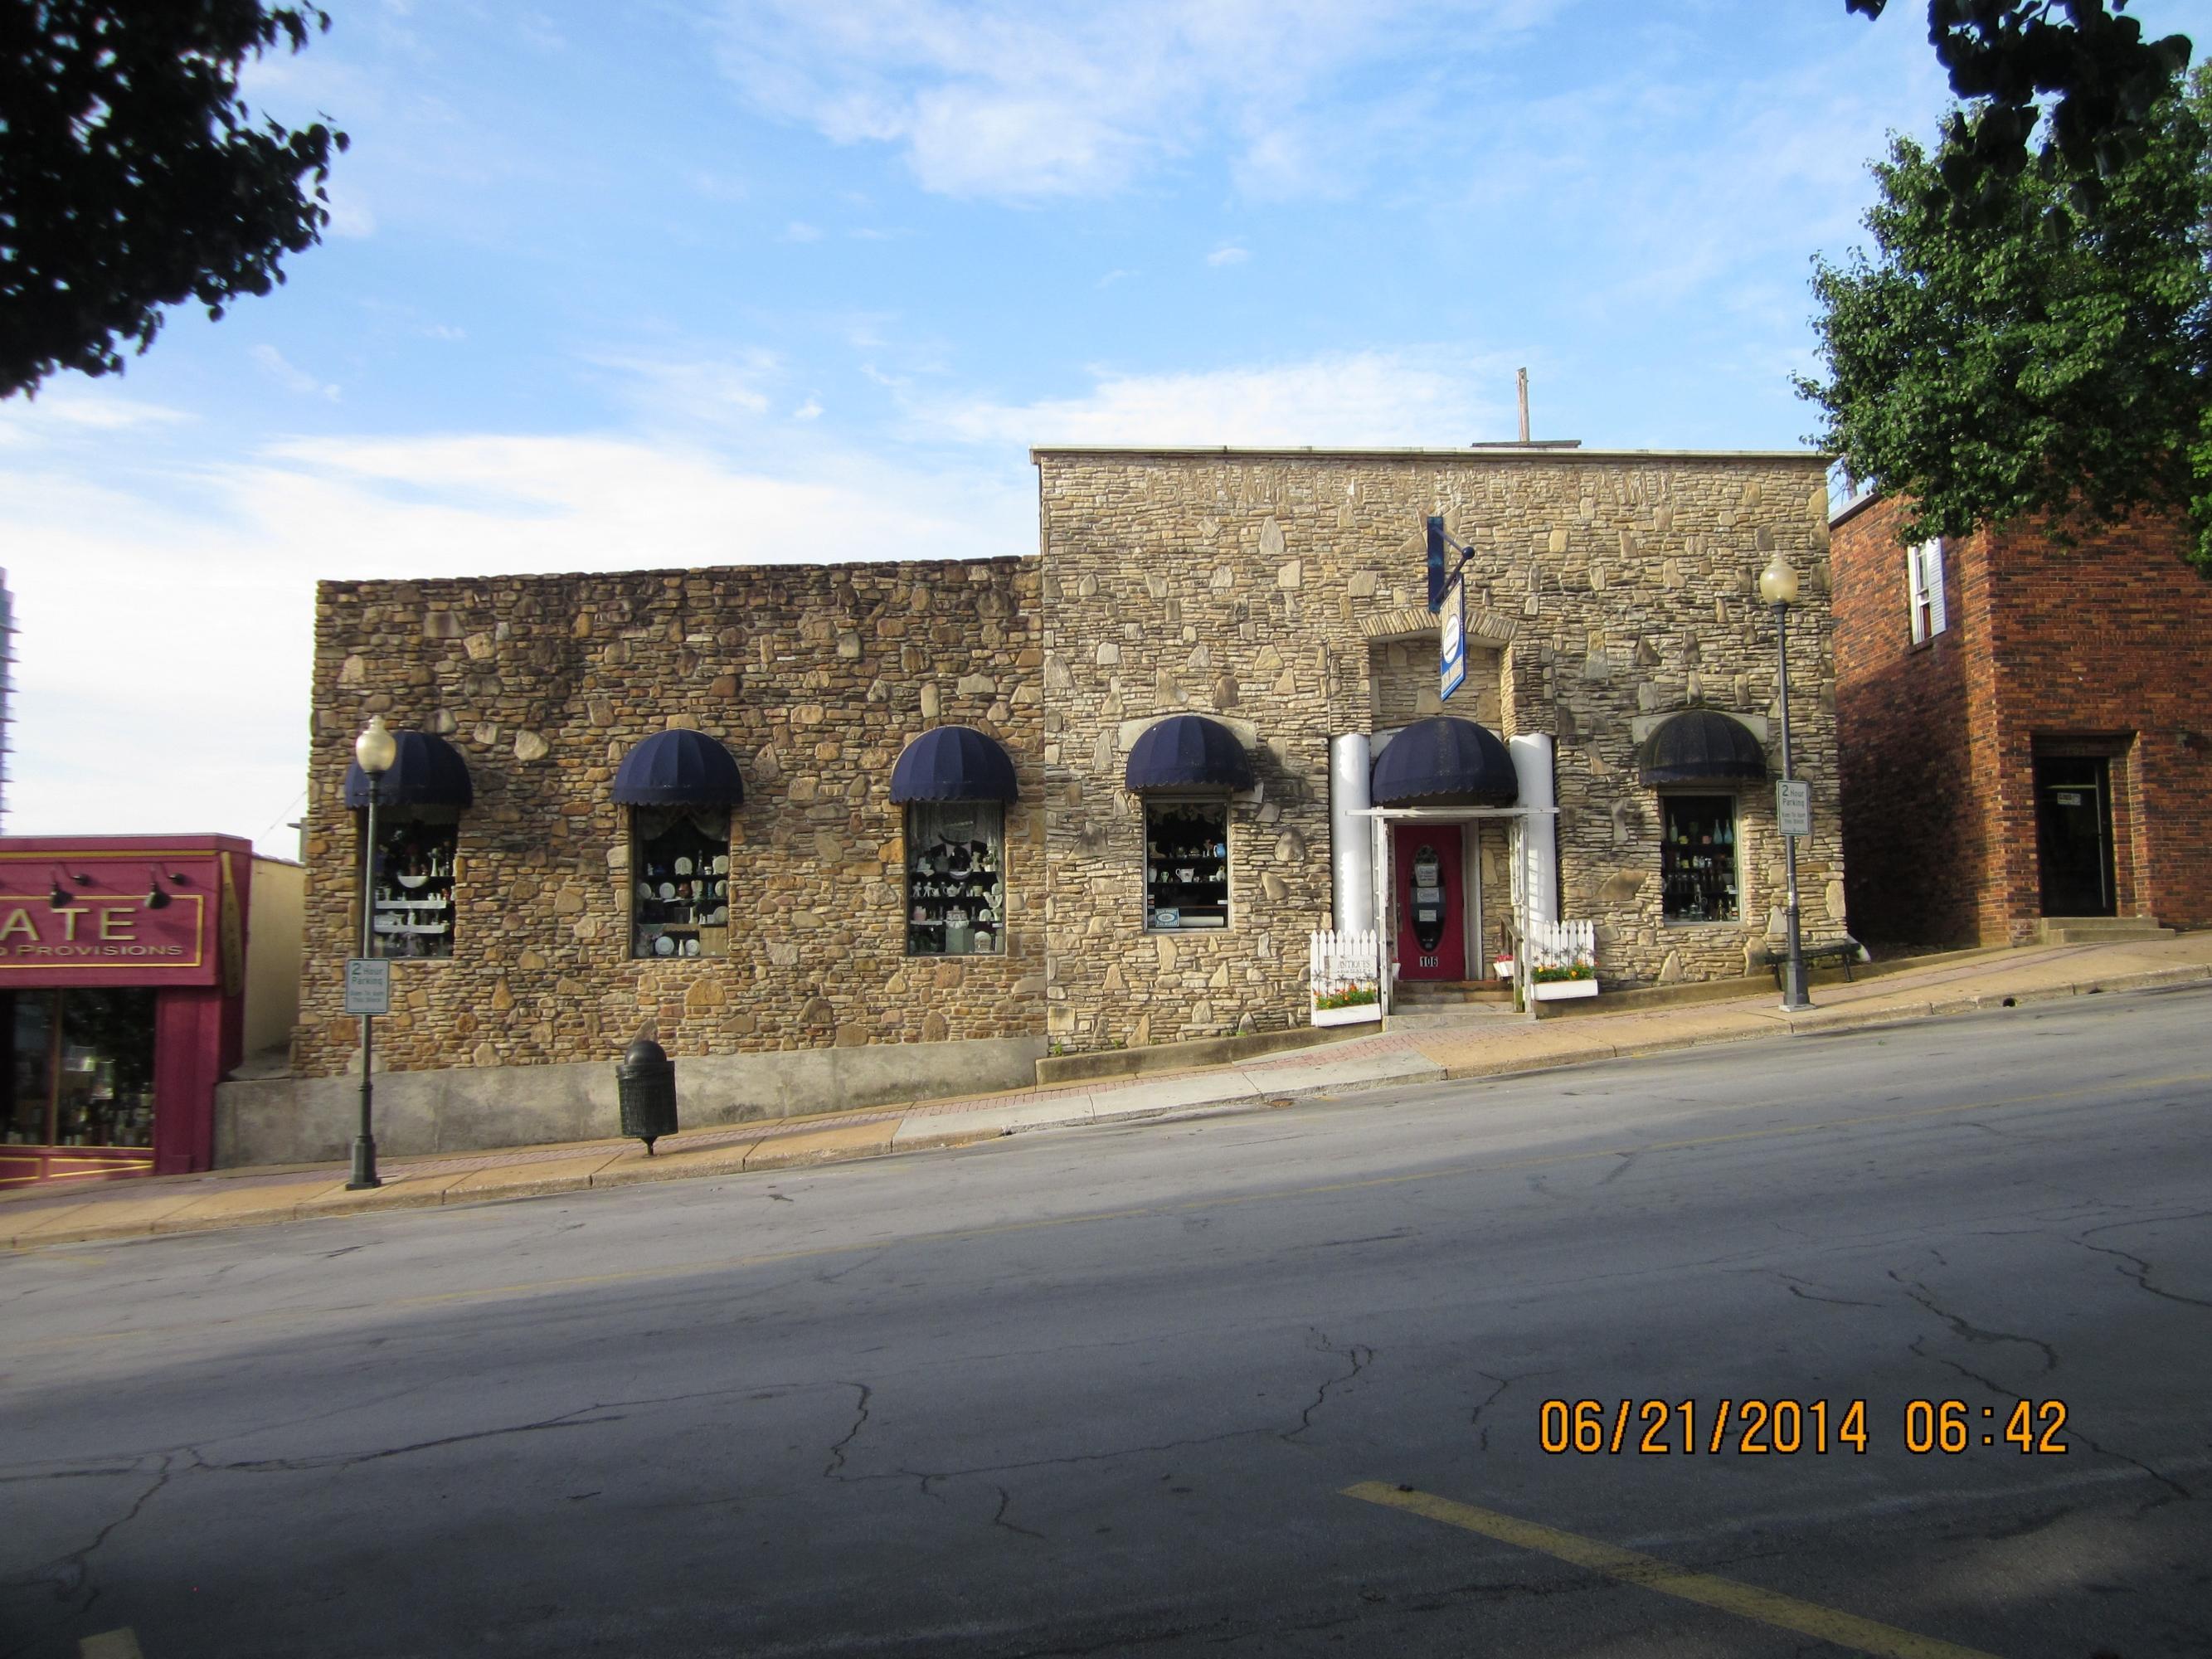 106 East Main Branson, MO 65616